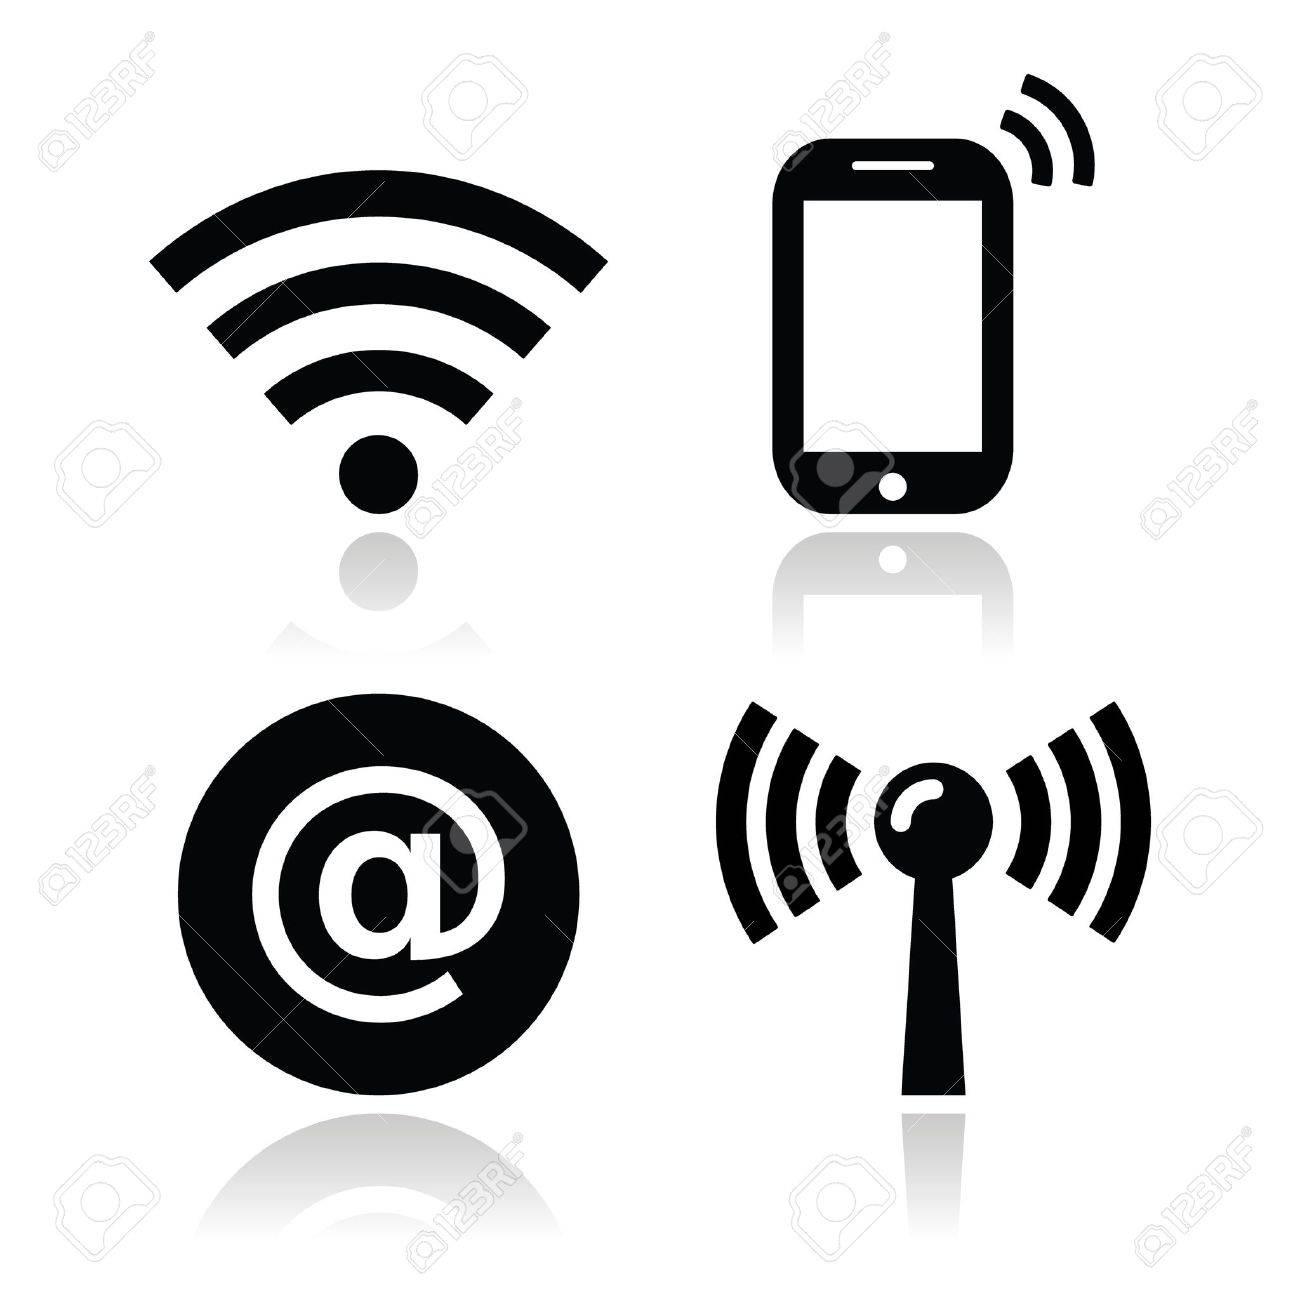 Wifi network, internet zone icons set - 18293307